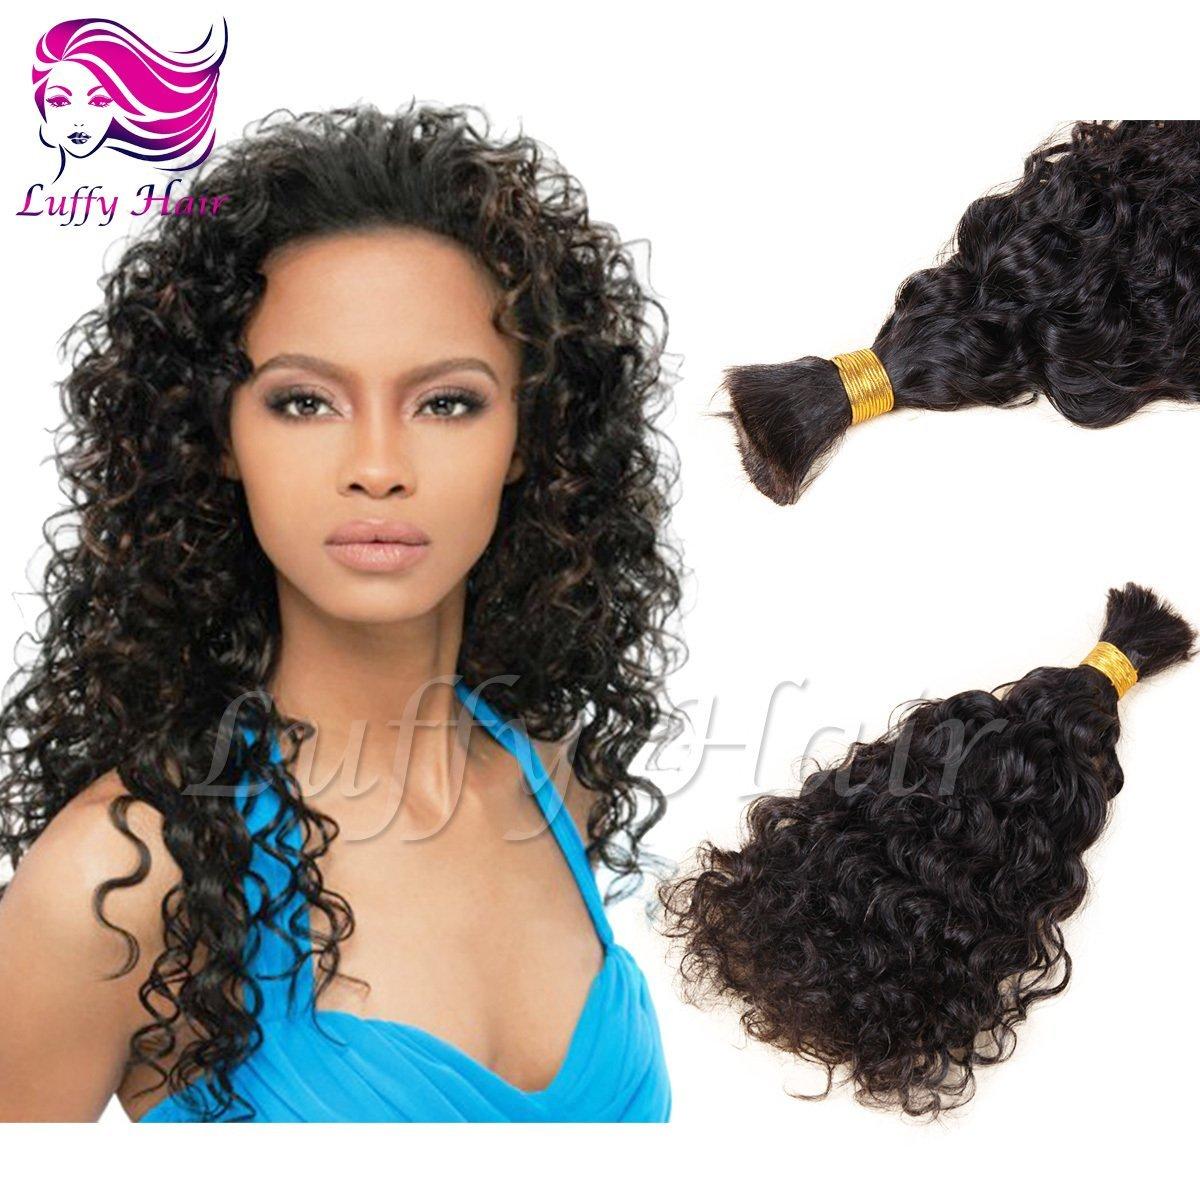 8A Virgin Human Hair Curly Braiding Hair Bulk - KBL001